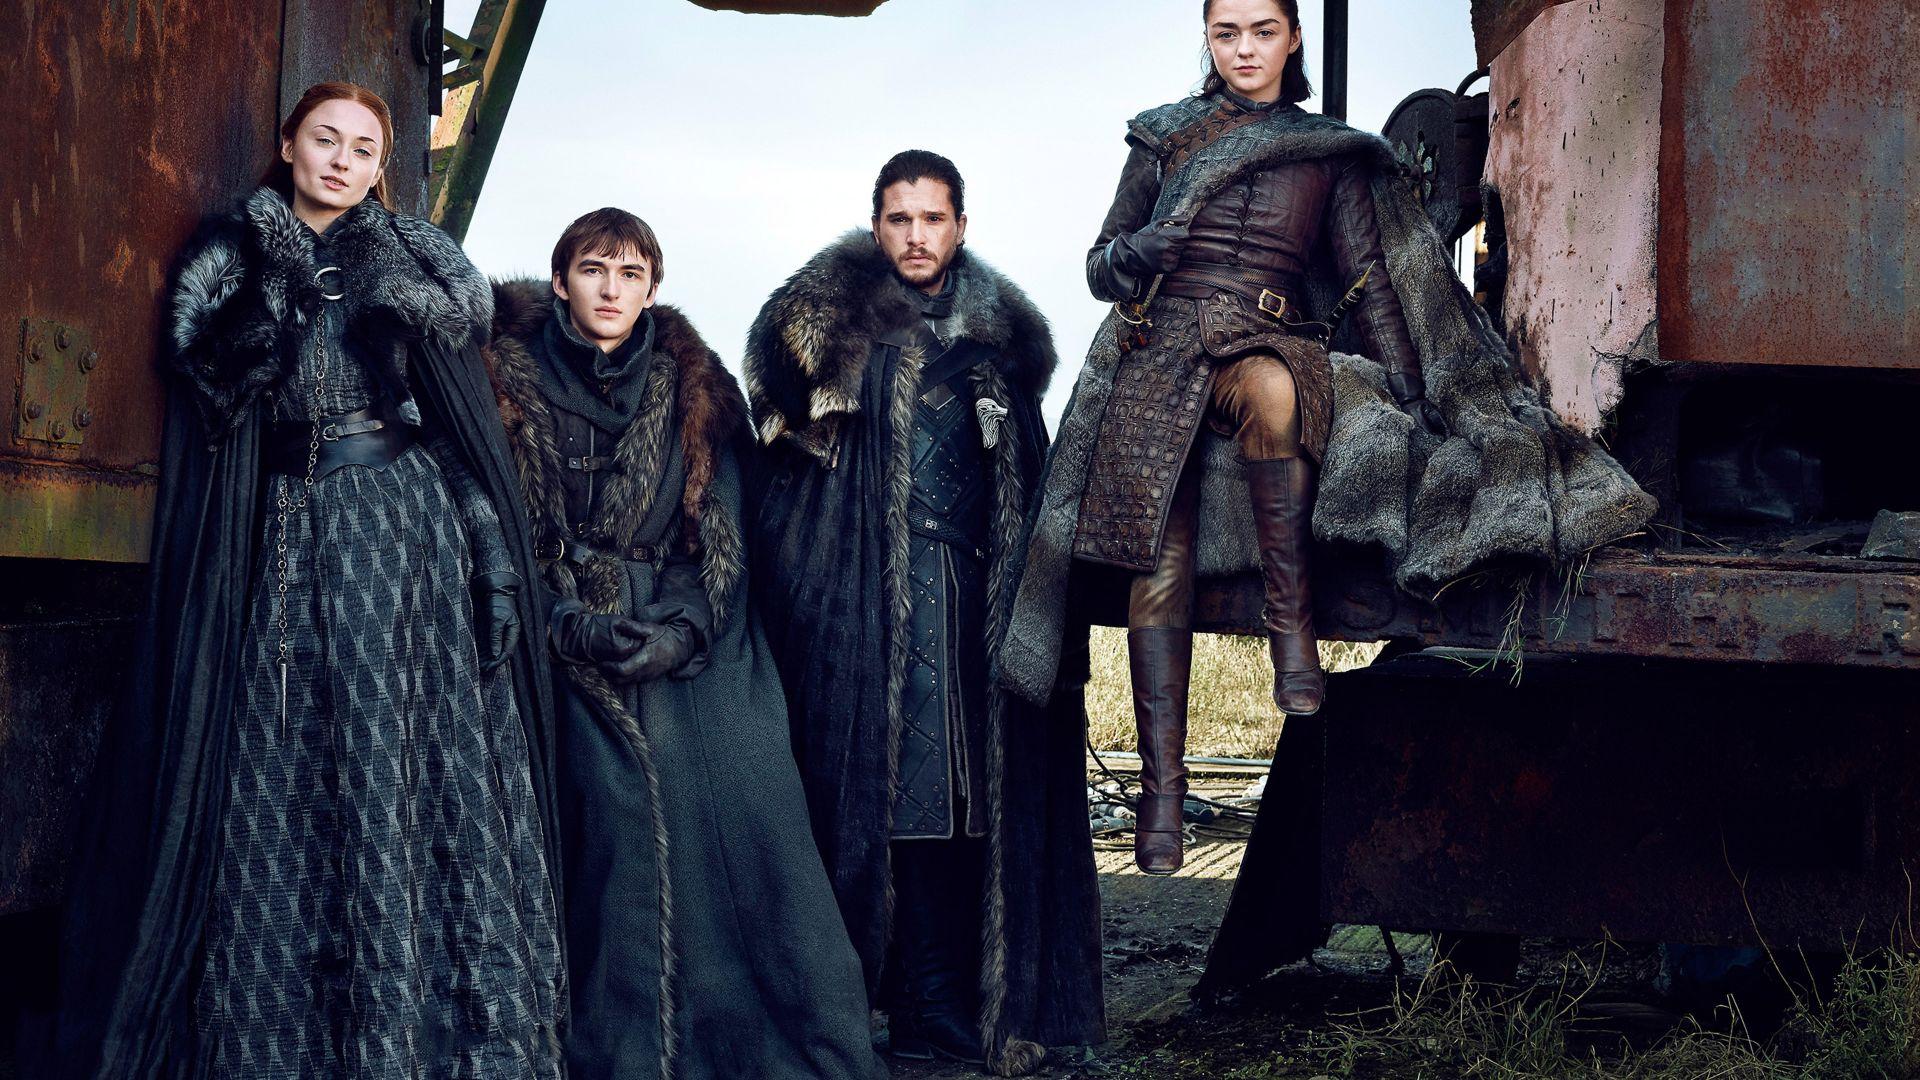 Wallpaper Game Of Thrones Season 7 Jon Snow Arya Stark